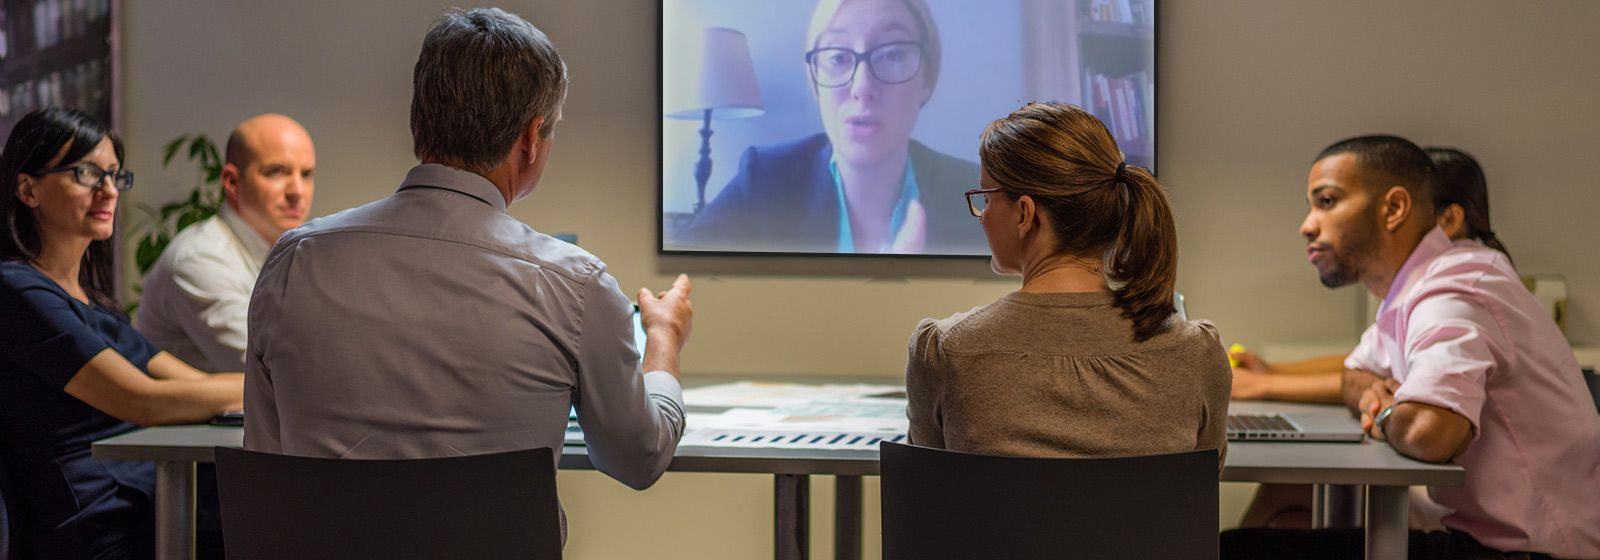 large business virtual assistants